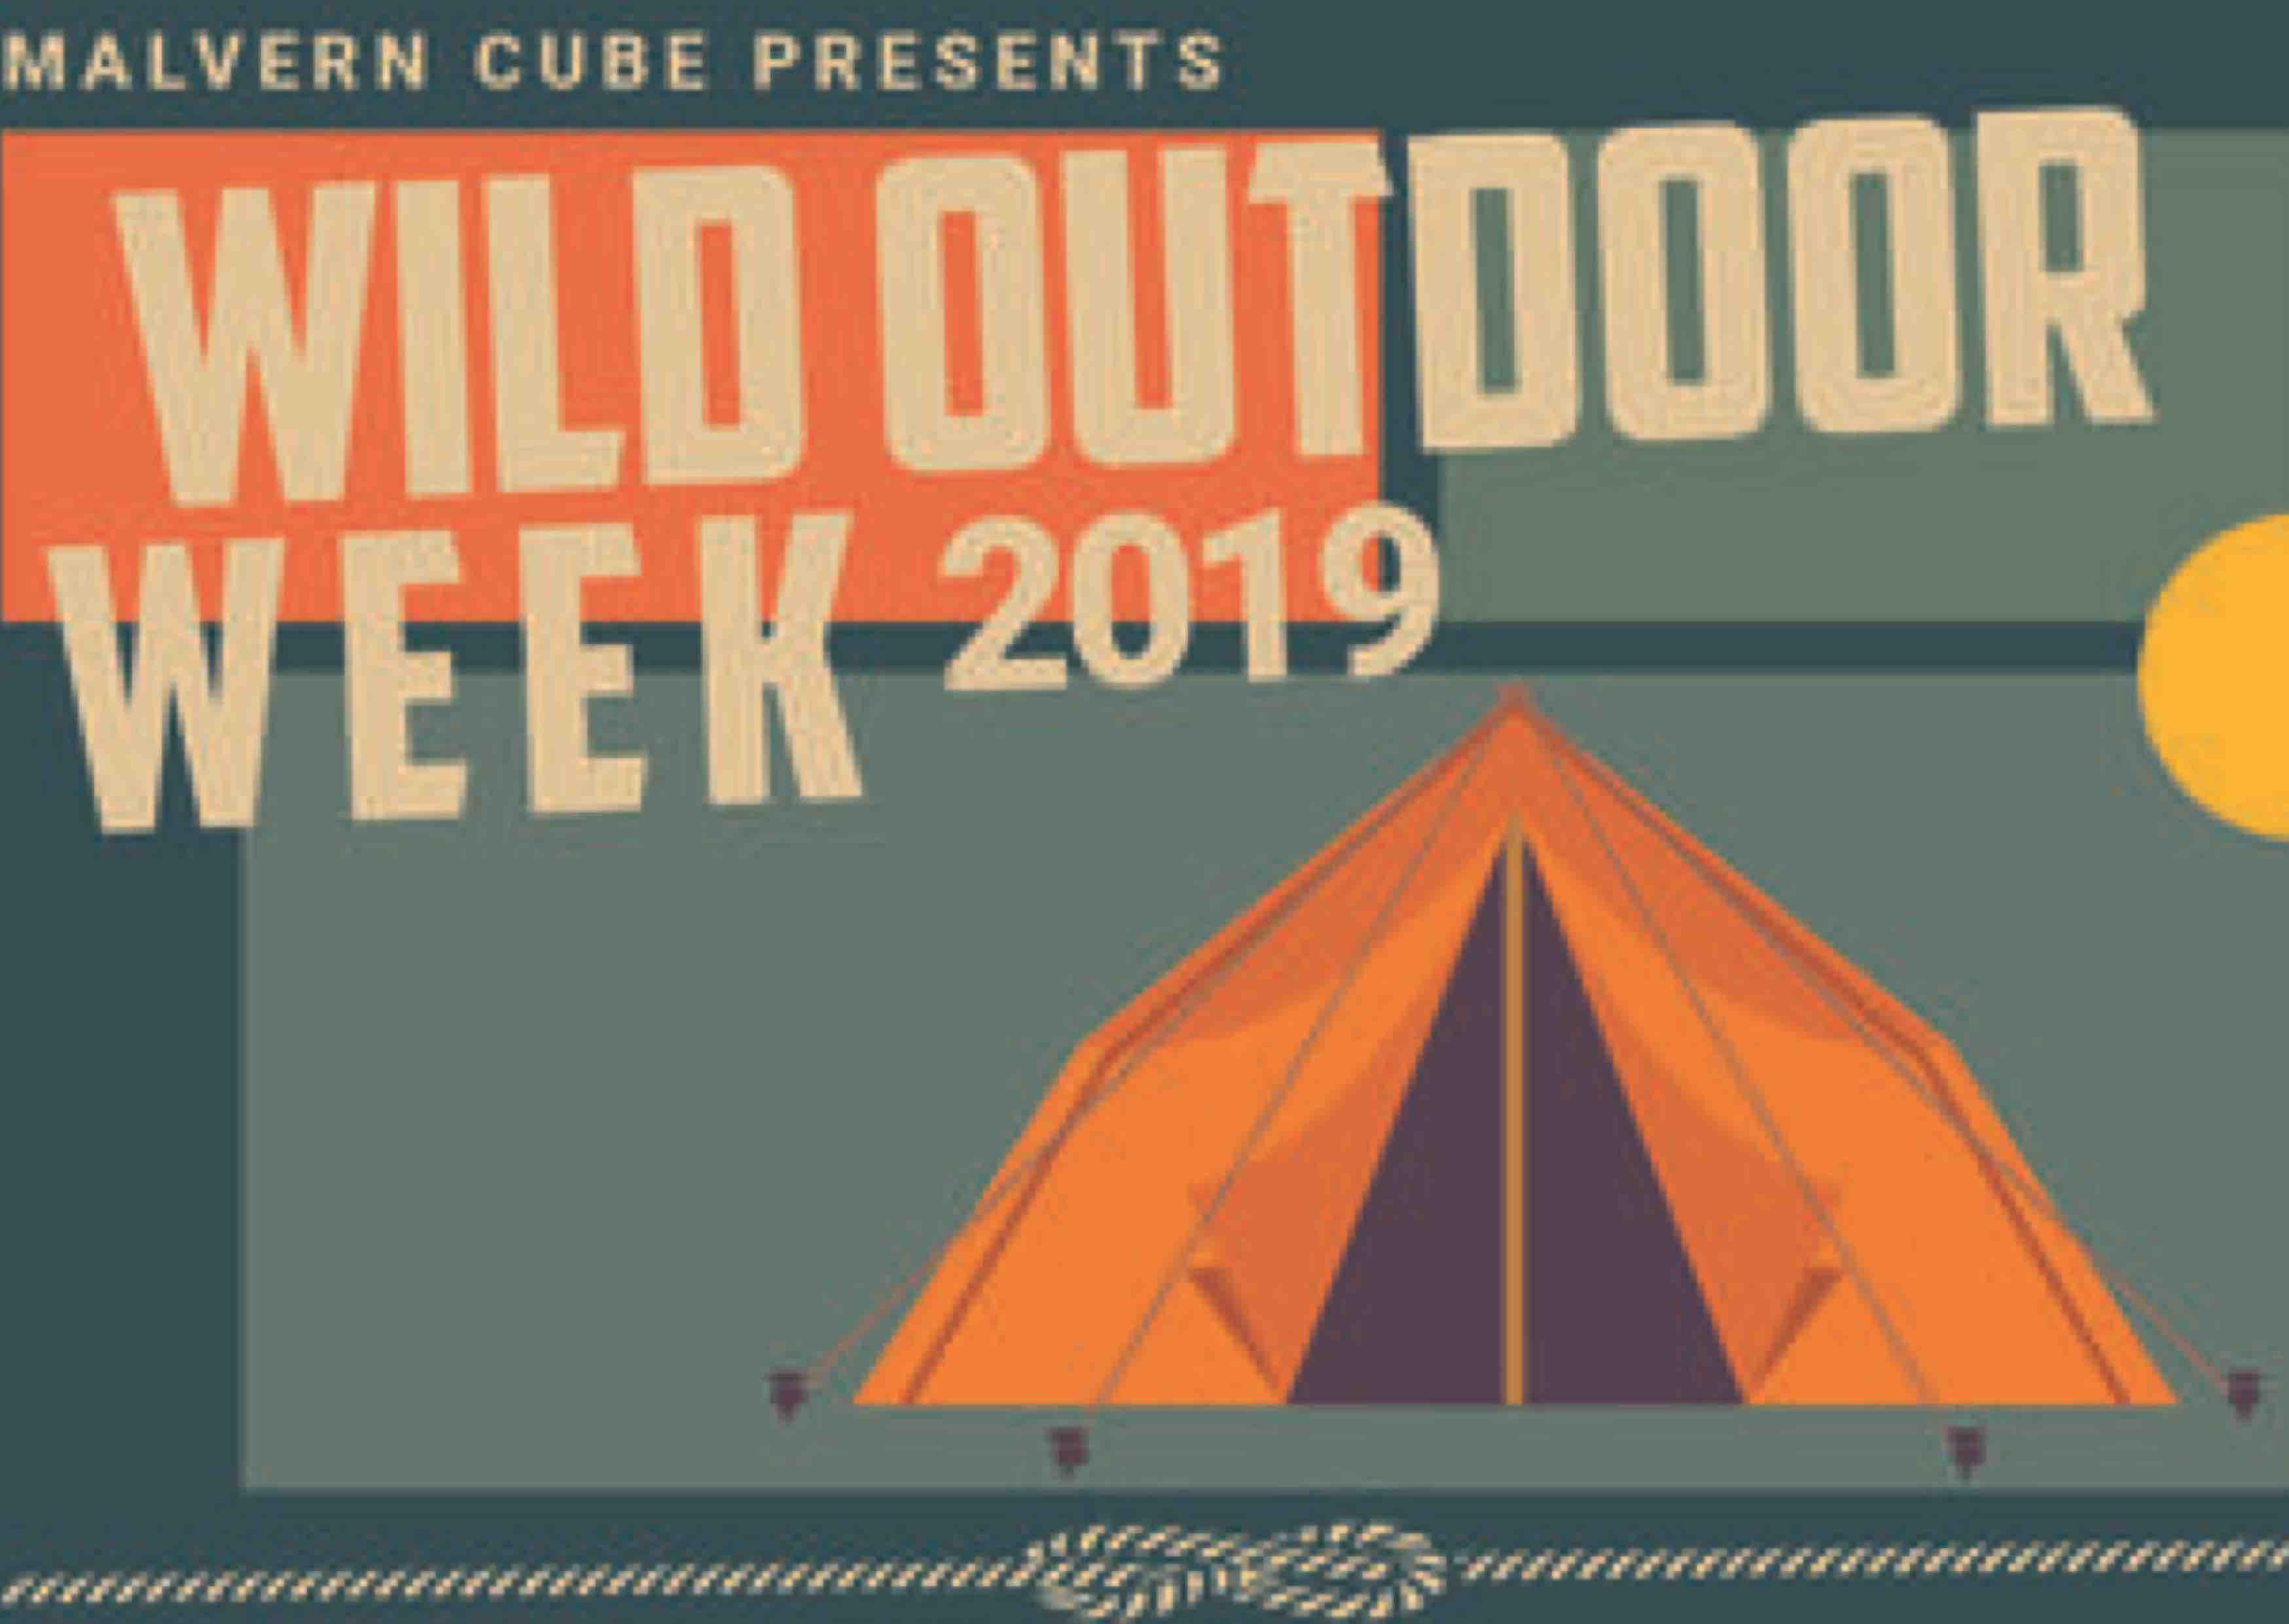 WOW: Wild Outdoor Week banner image